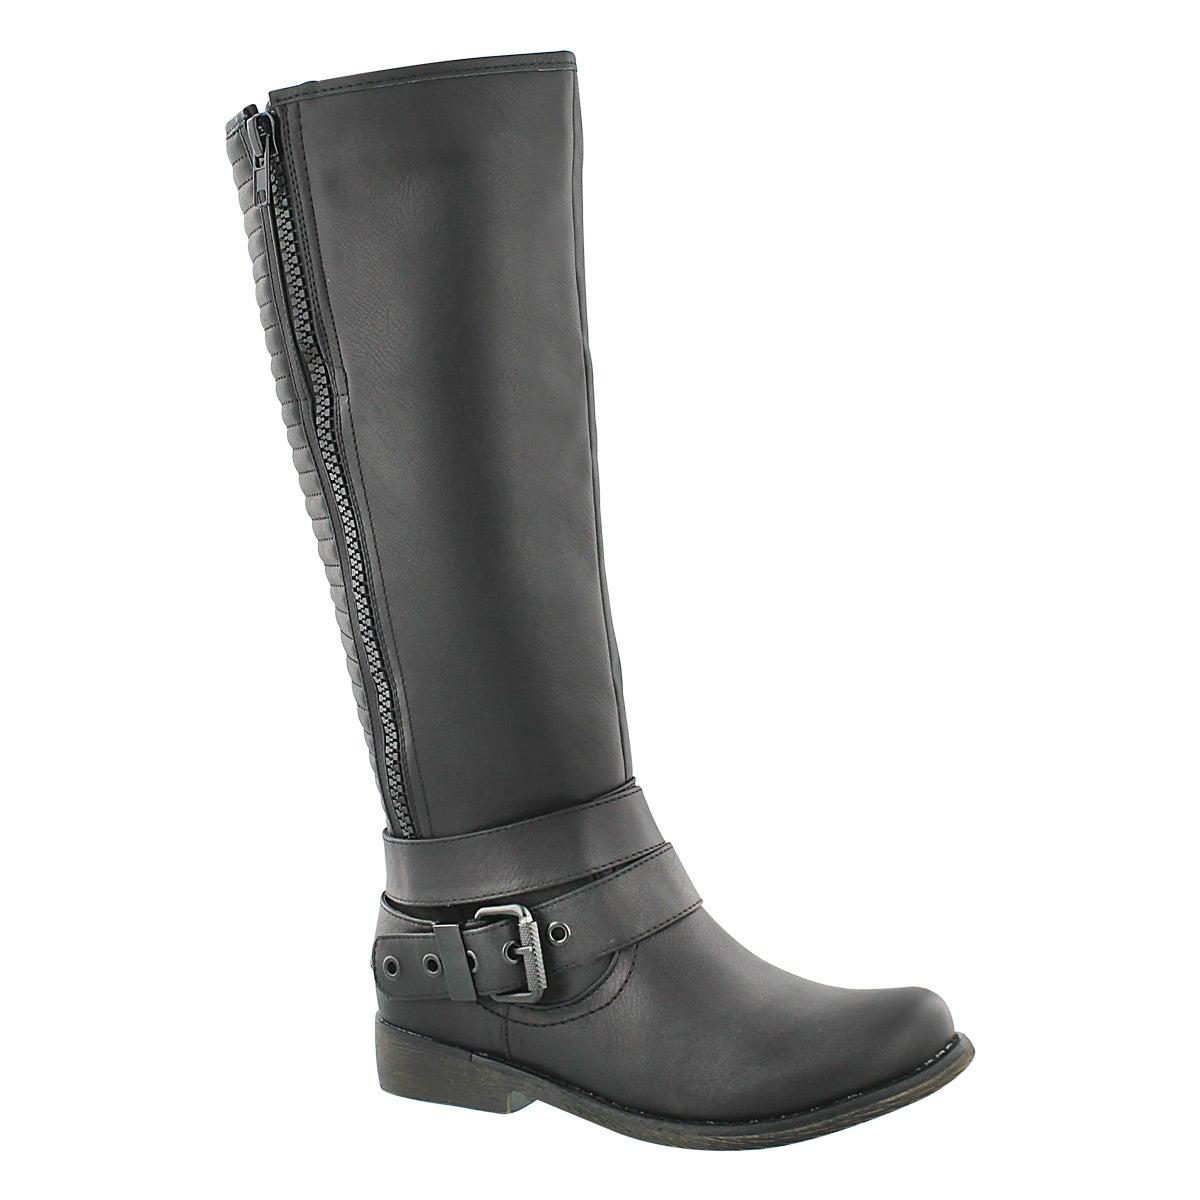 Women's BLAKELEY black riding boots